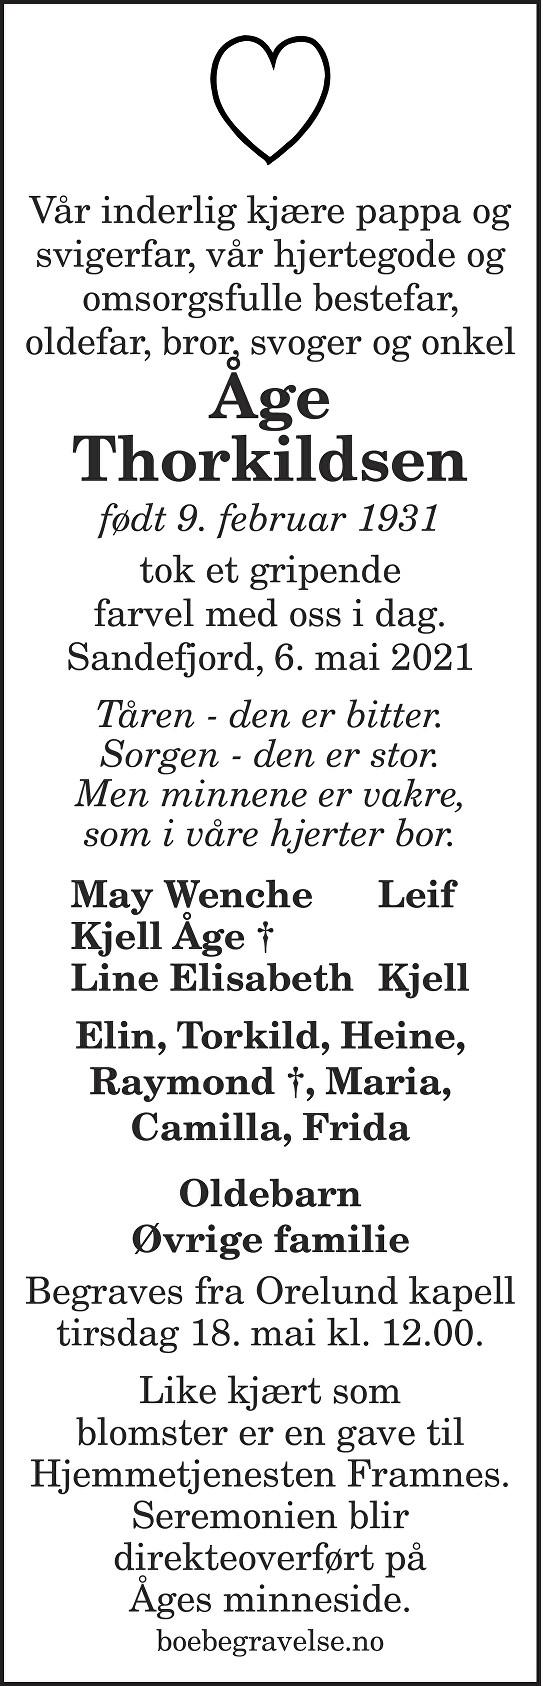 Åge Thorkildsen Dødsannonse